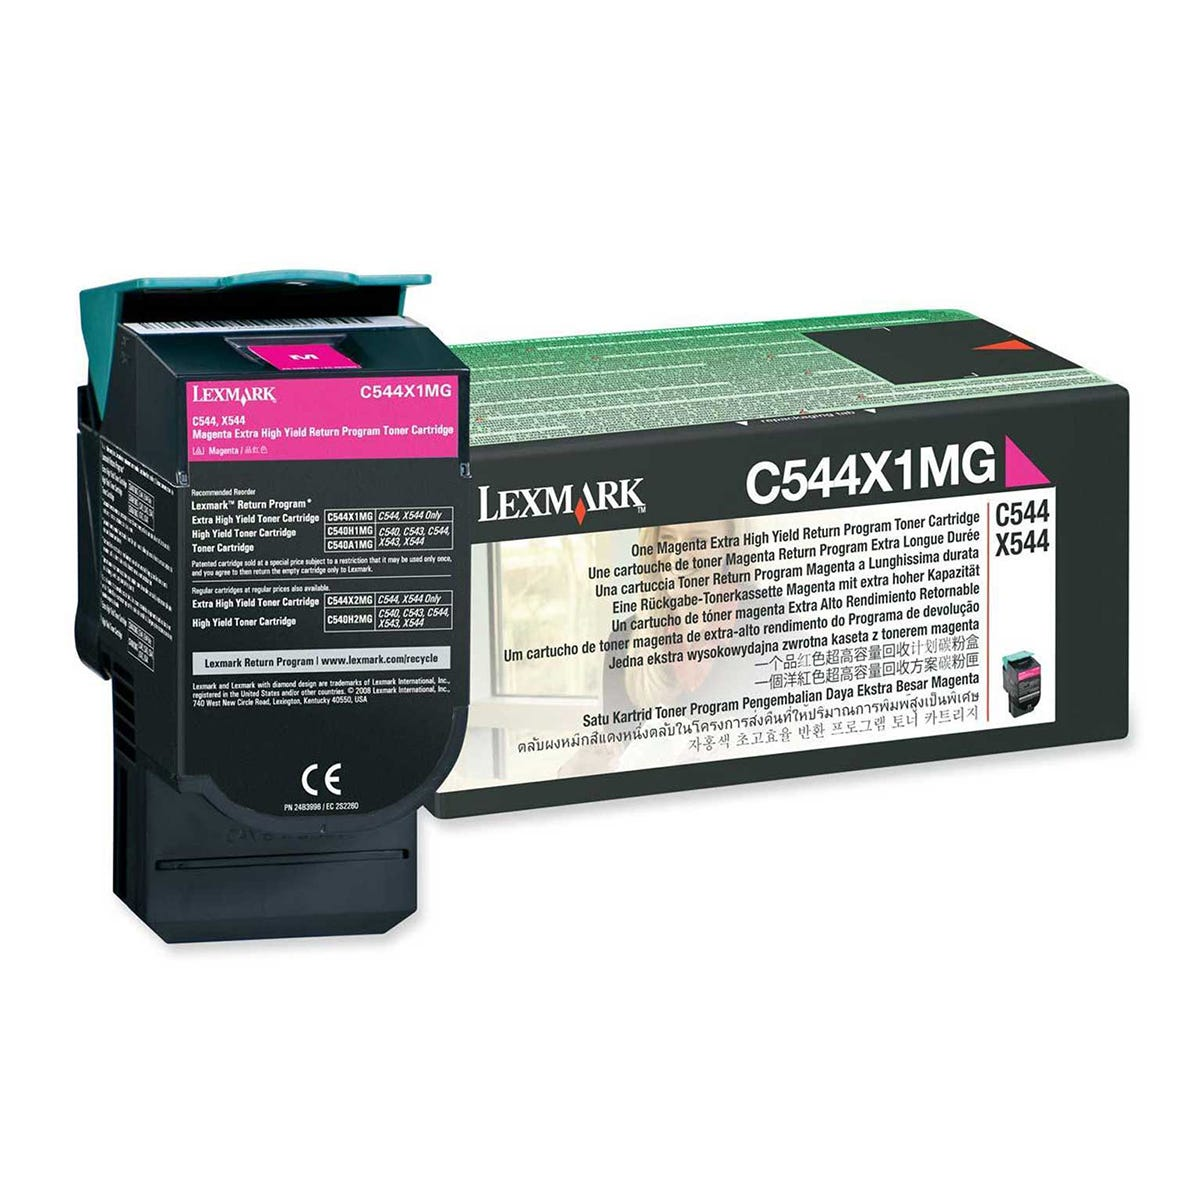 Image of Lexmark C544X1MG Toner Cartridge Extra High Yield, Magenta